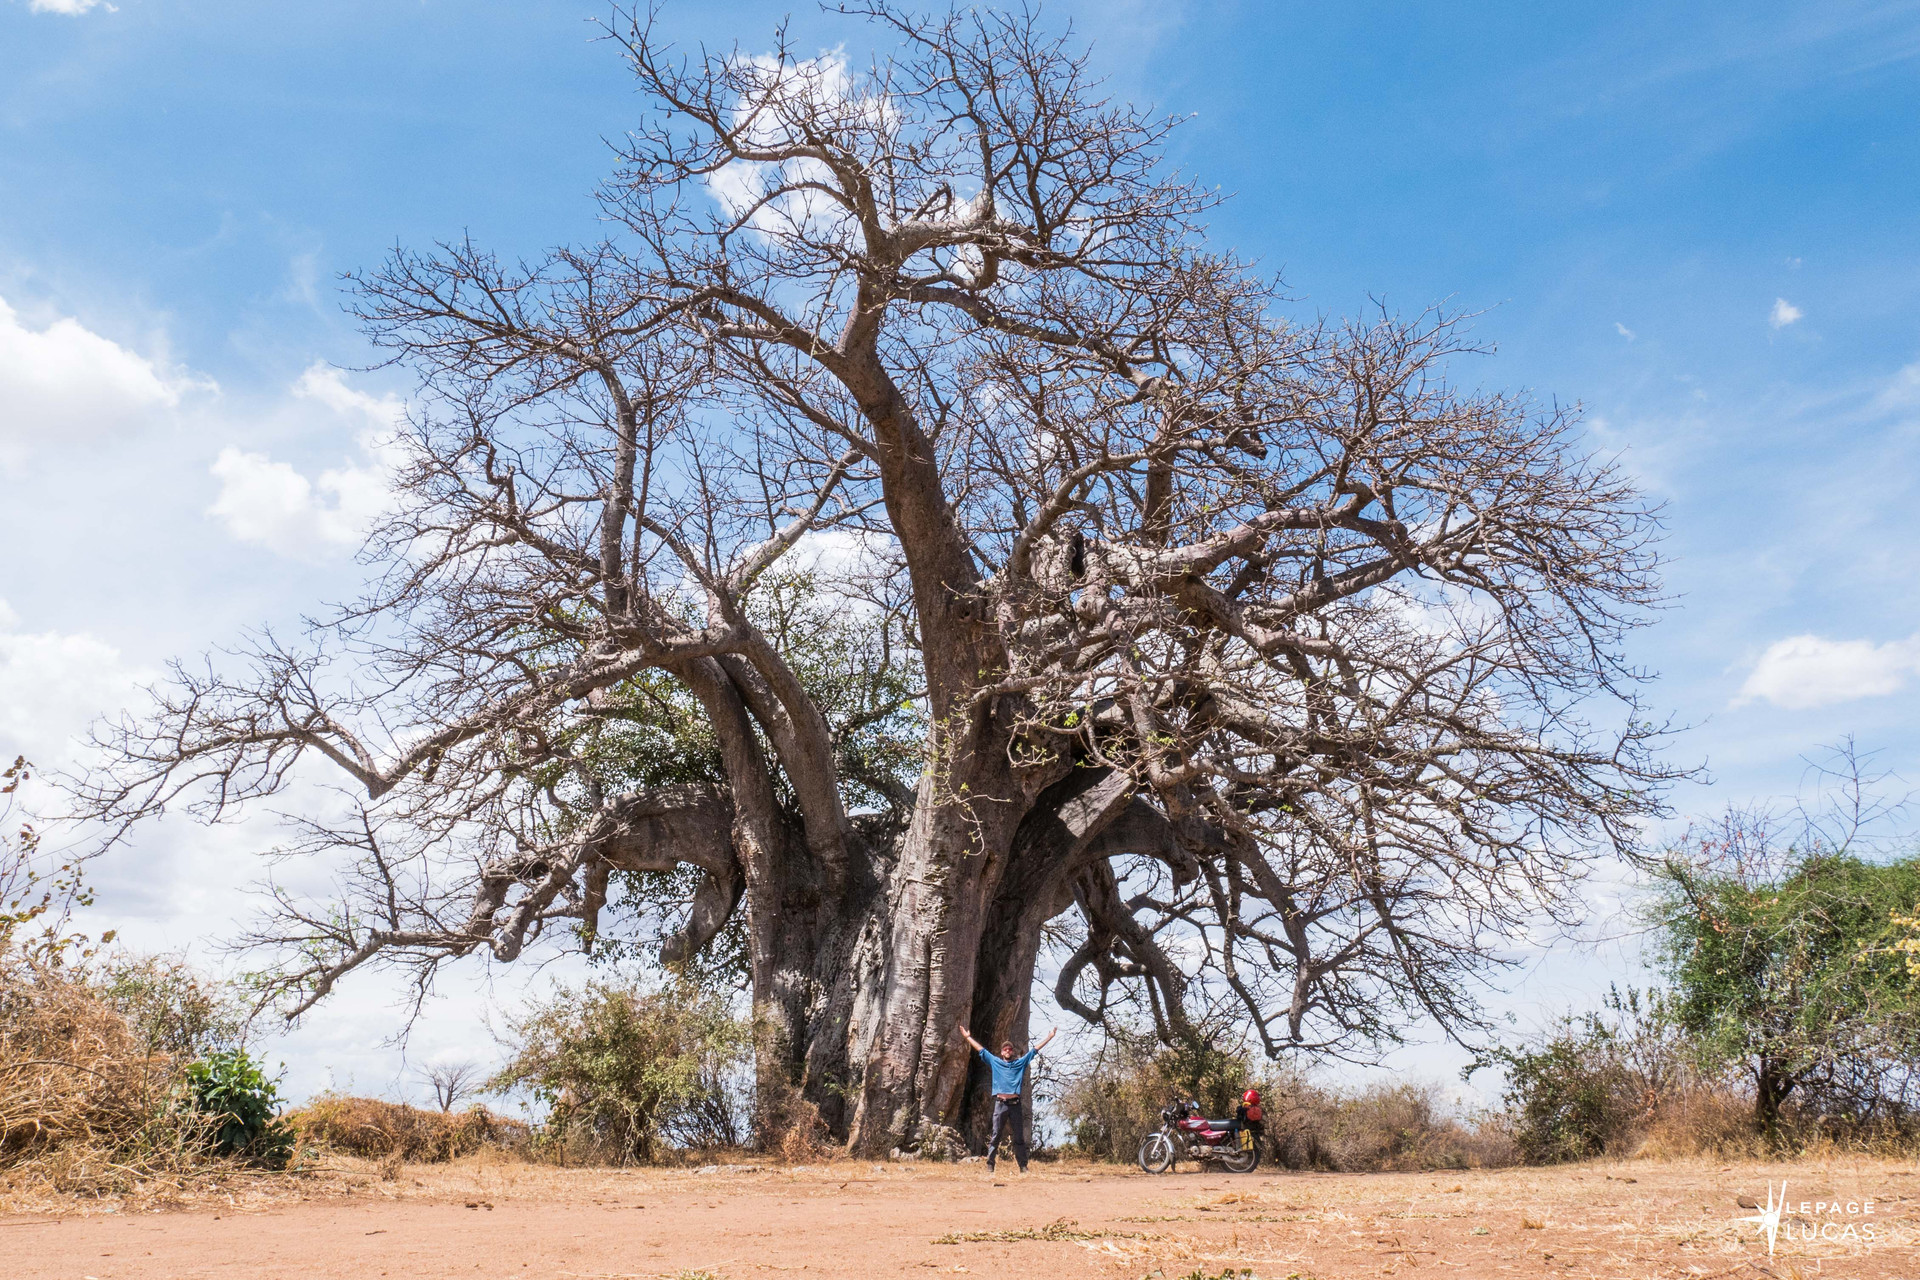 Afrique-17.jpg